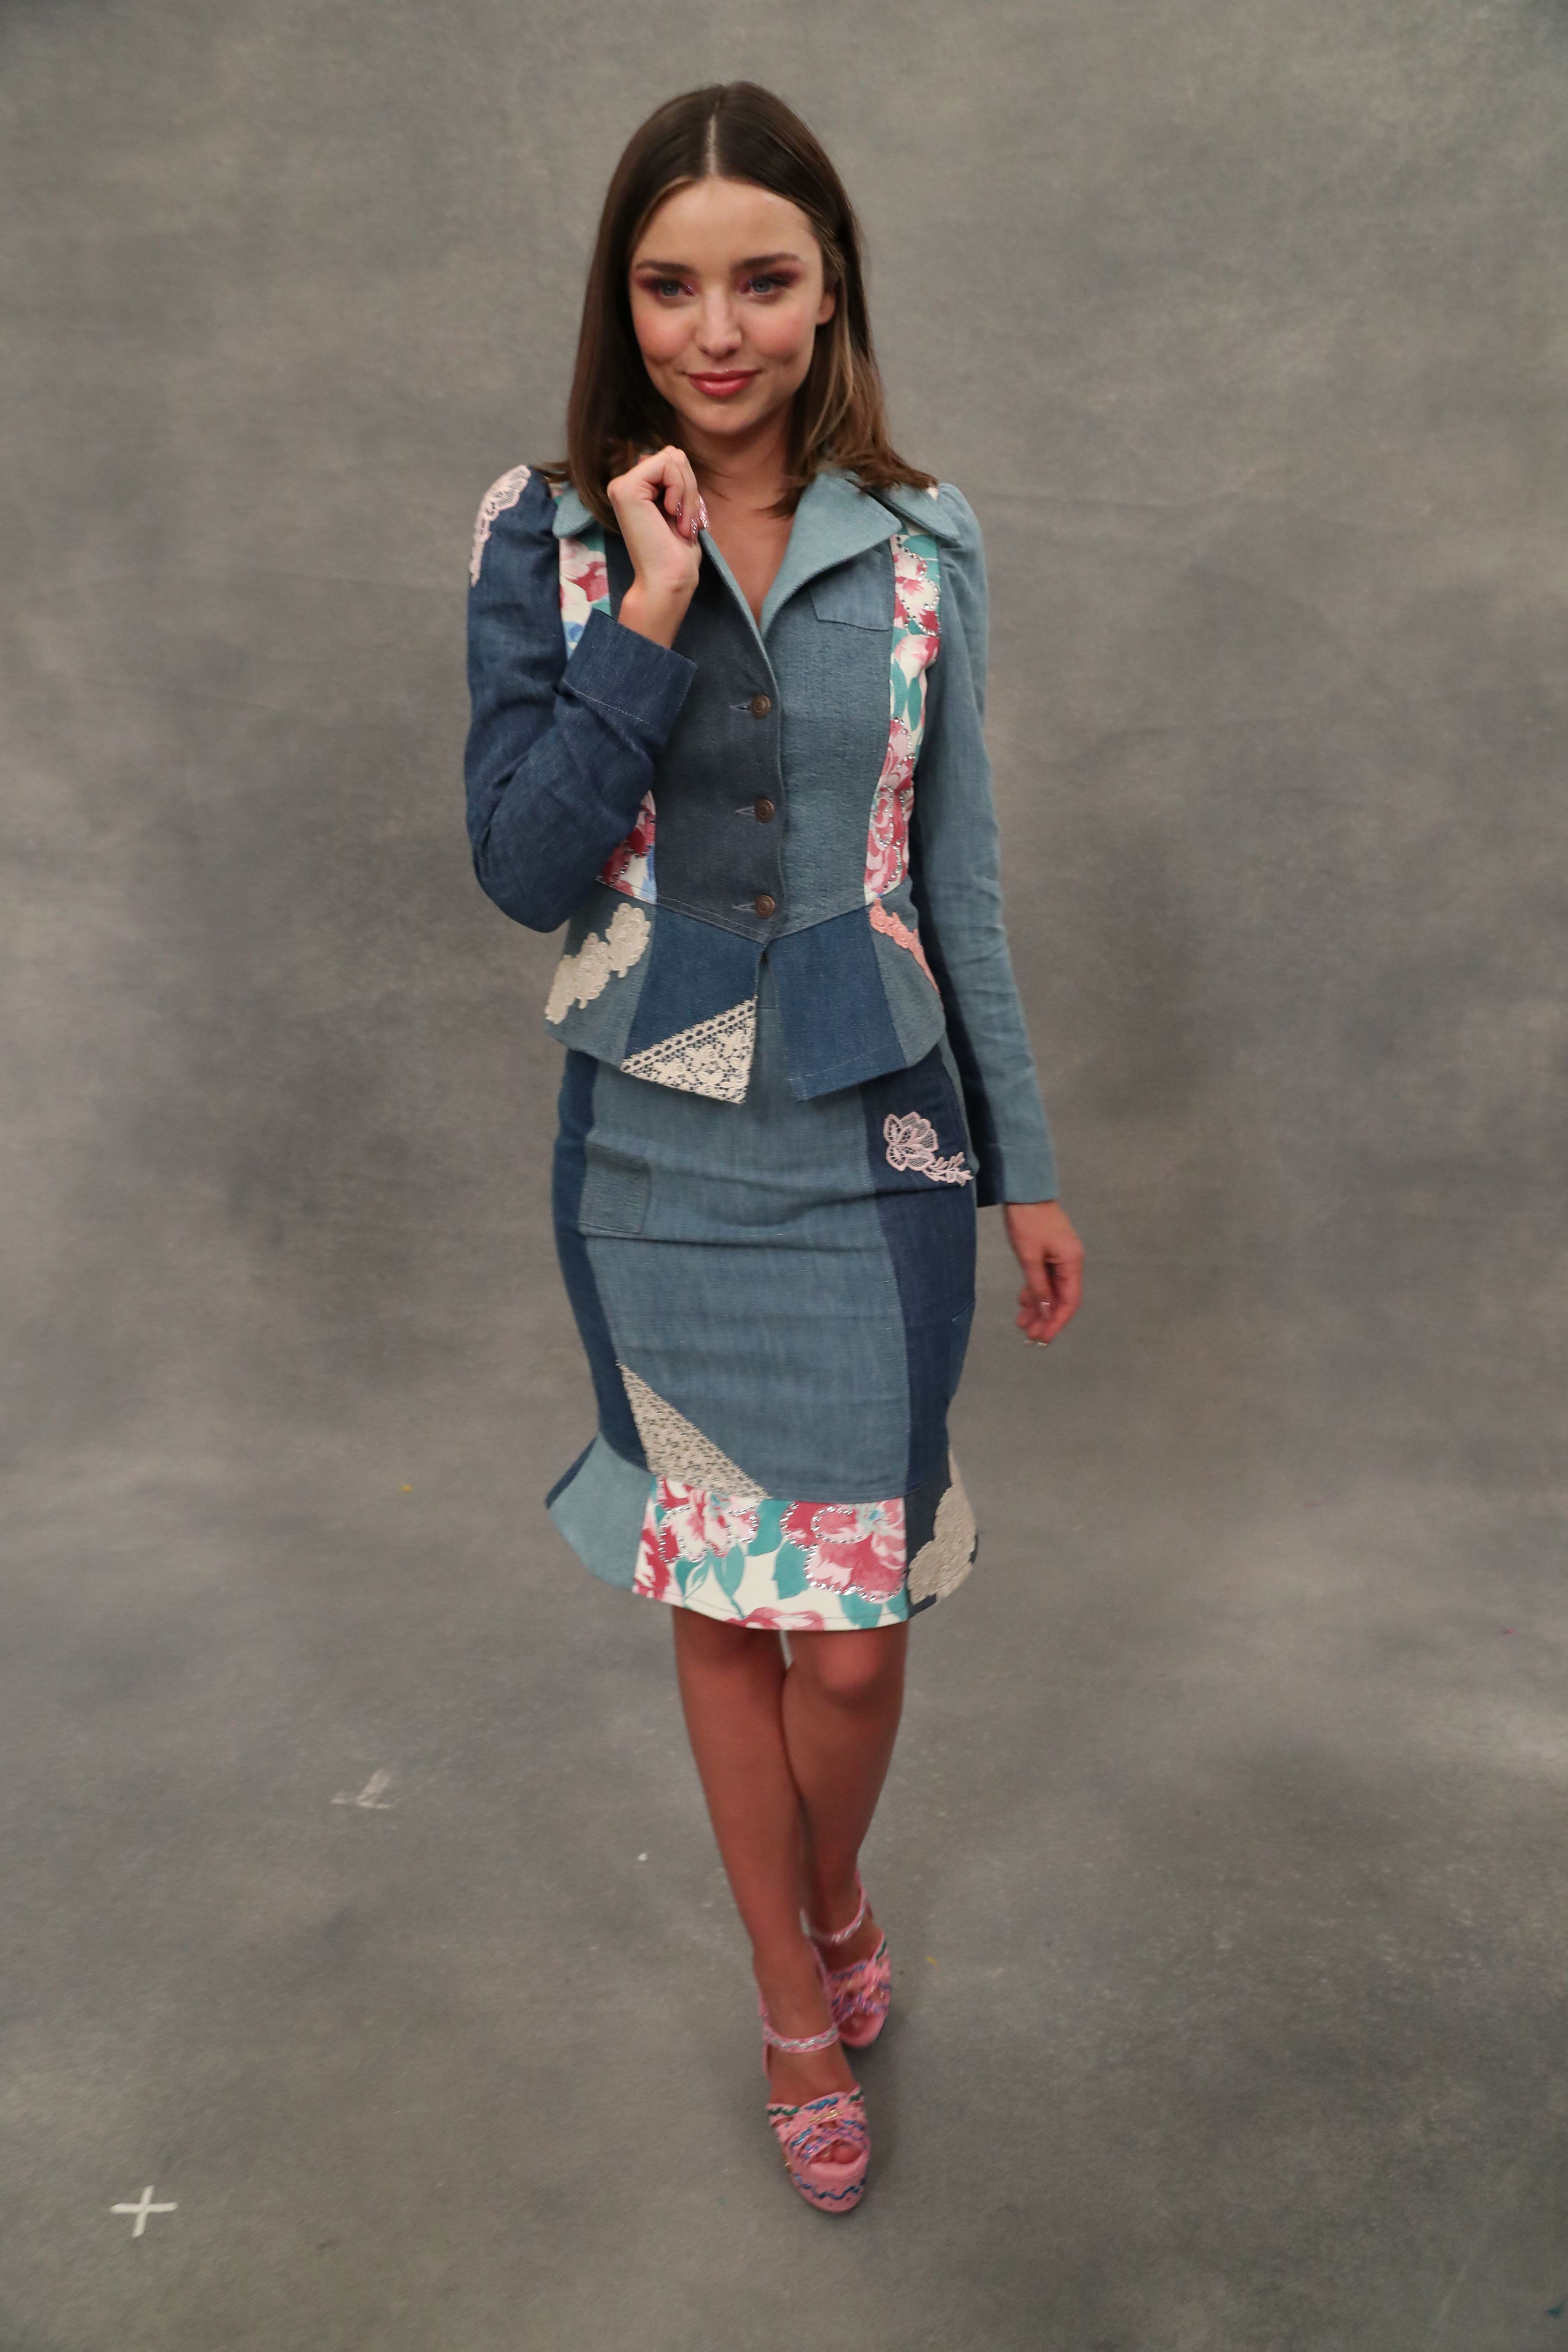 Miranda Kerr - Page 1514 - Female Fashion Models - Bellazon Miranda Kerr Bellazon